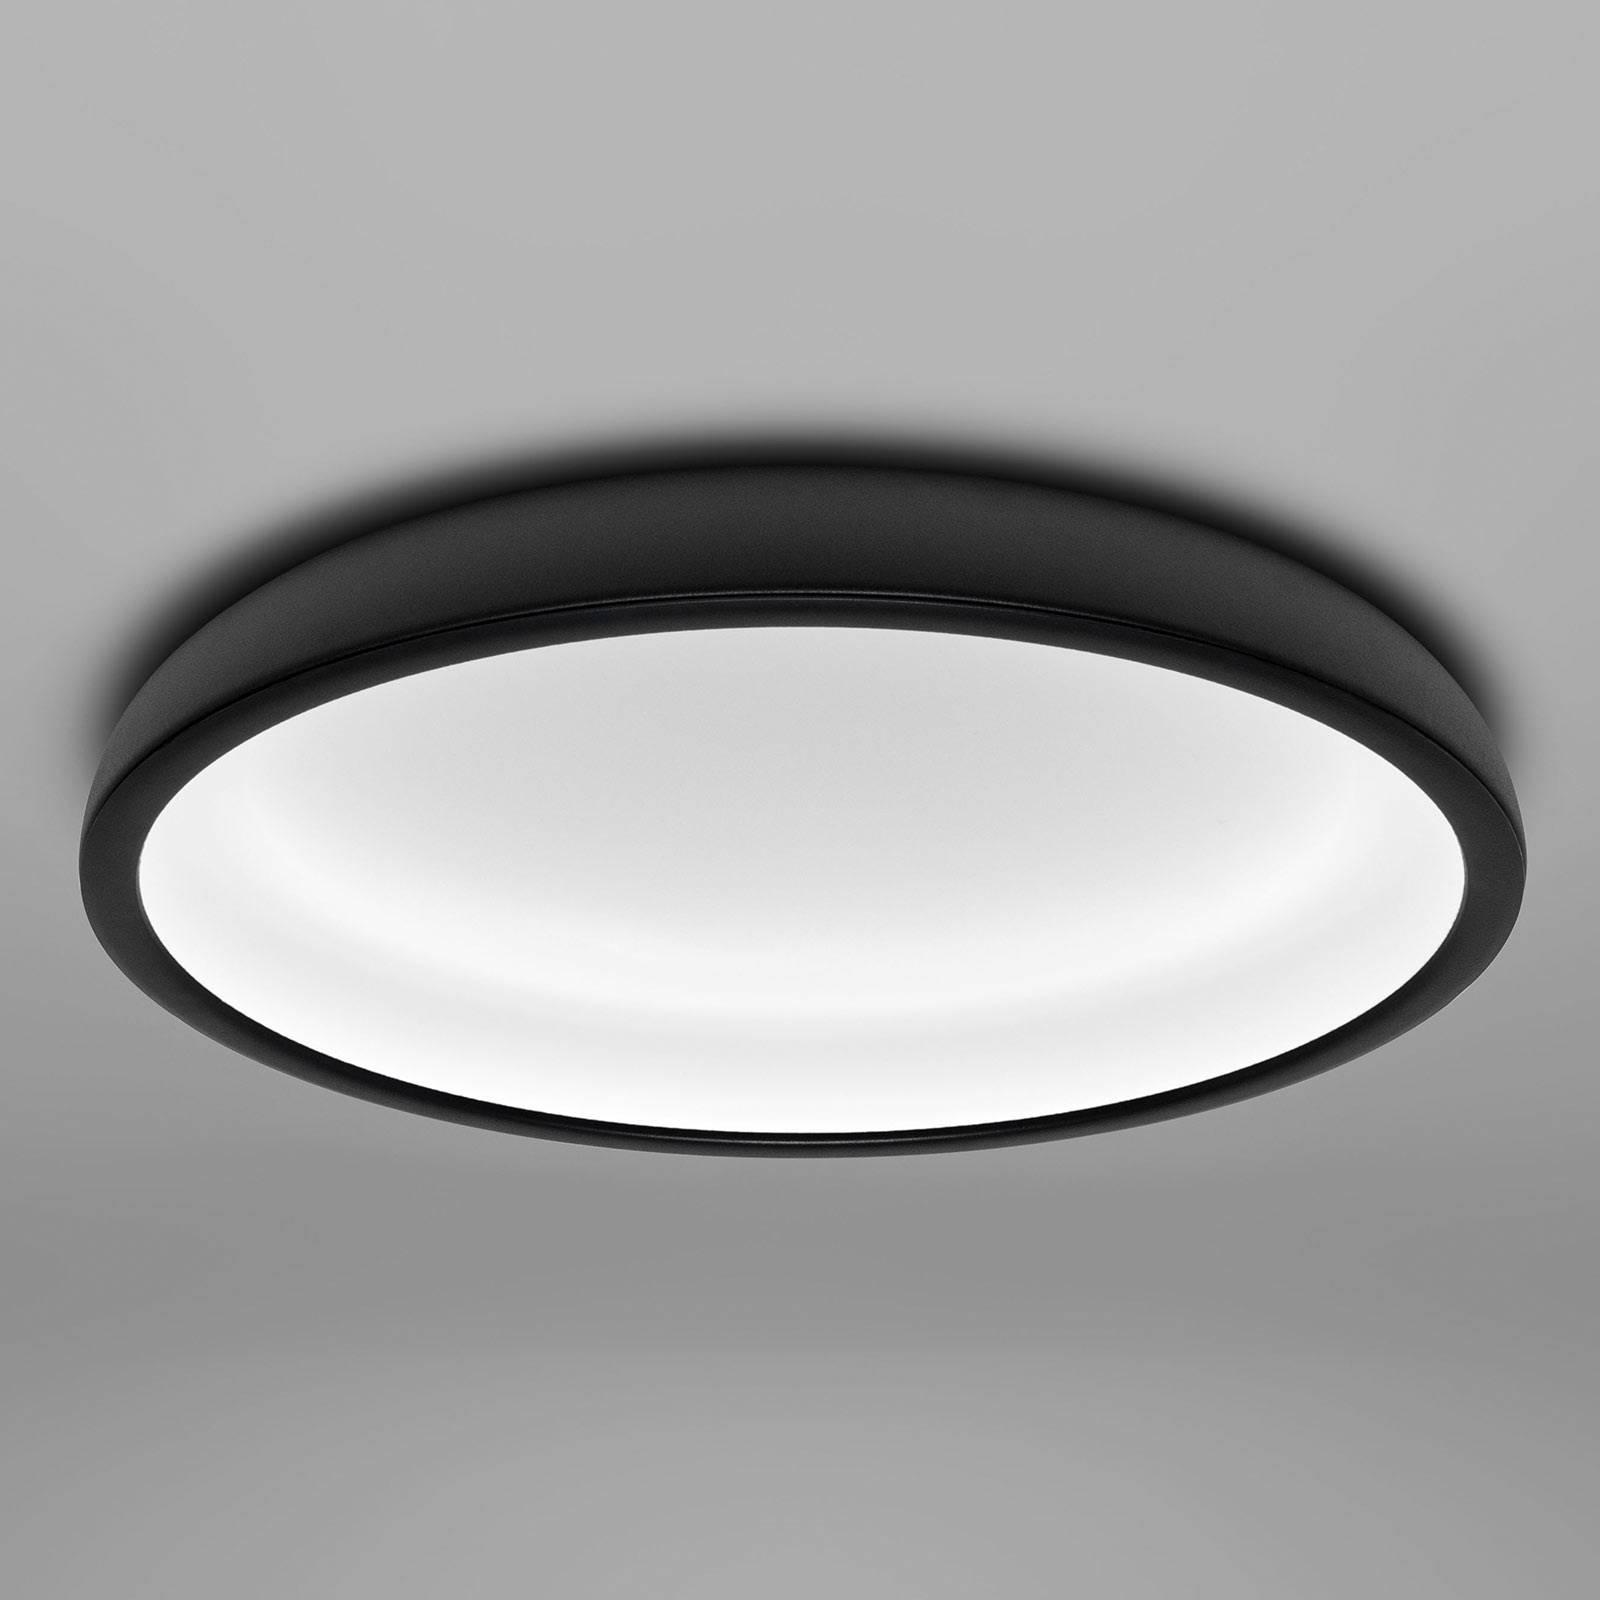 LED-kattovalaisin Reflexio, Ø 46 cm, musta